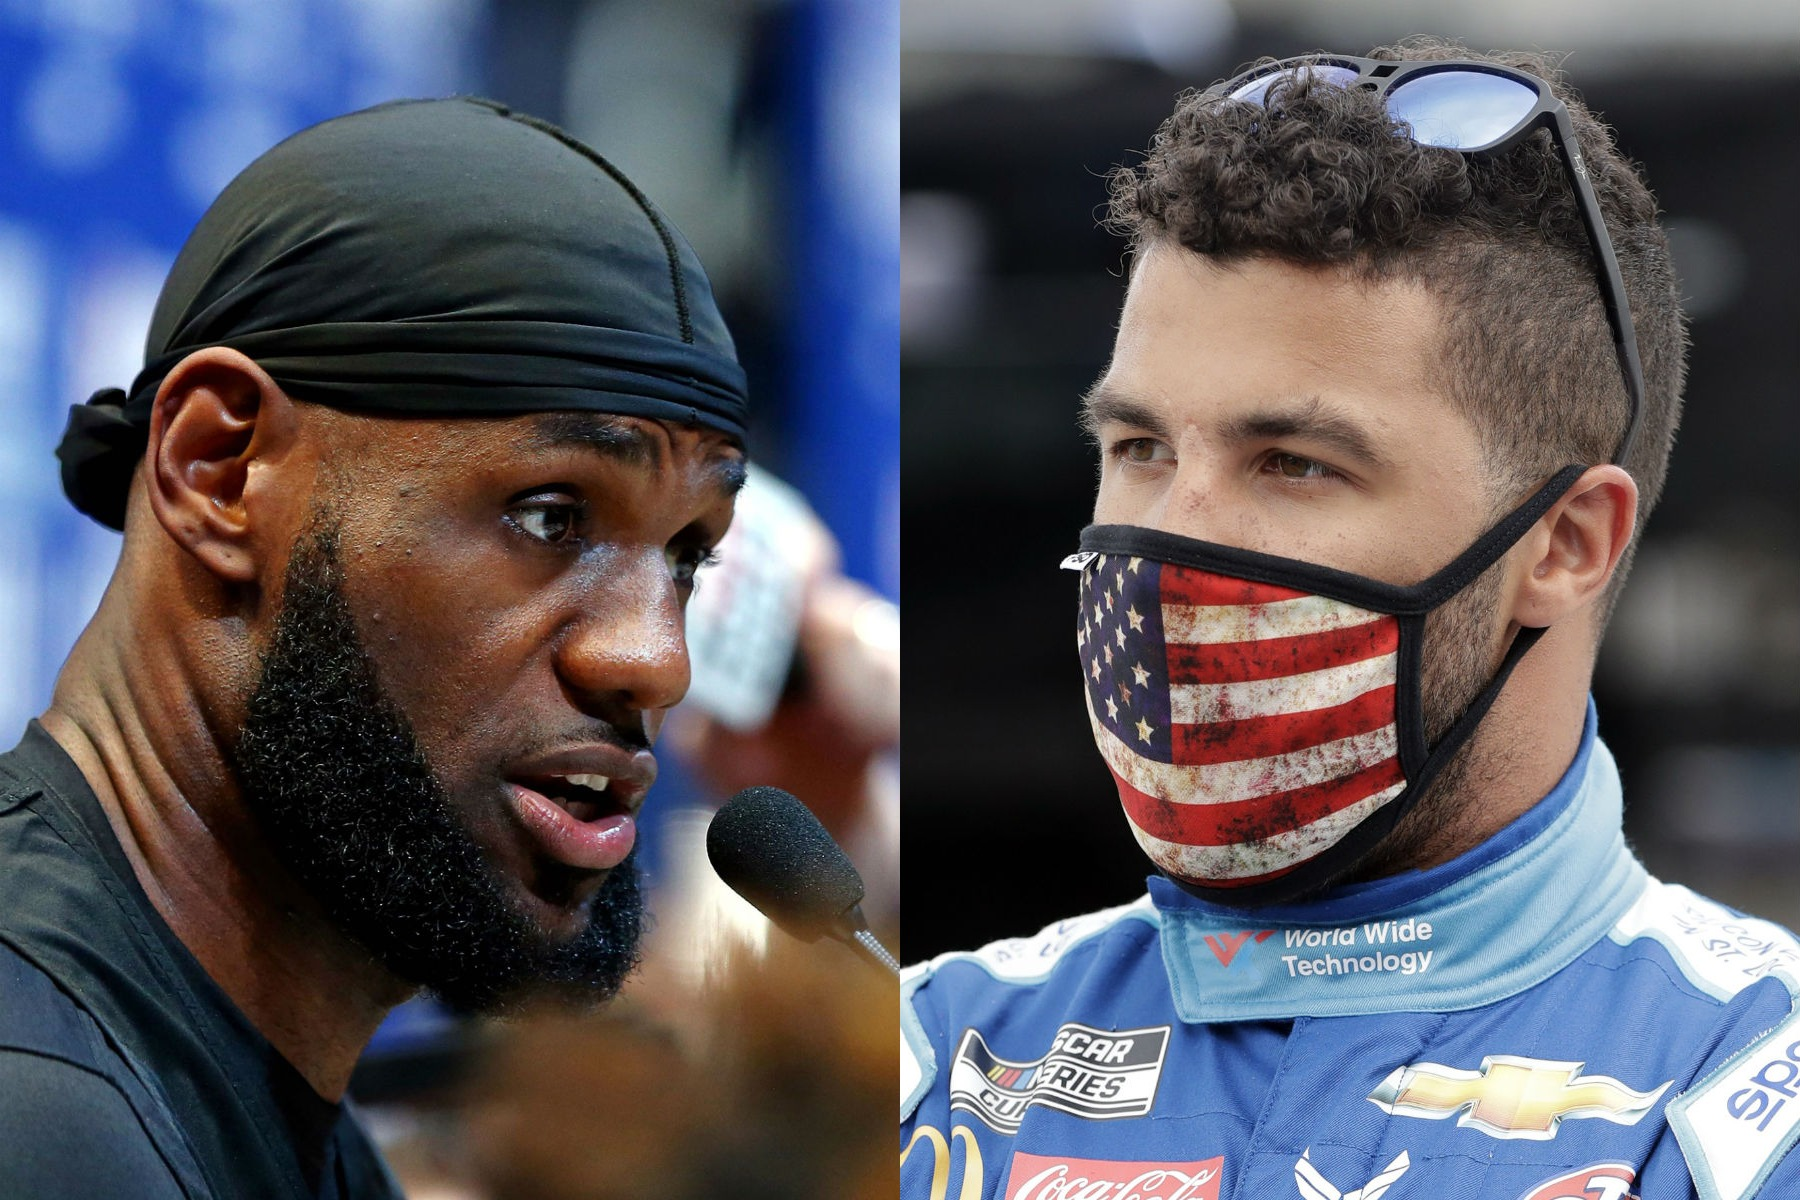 LeBron James and Bubba Wallace